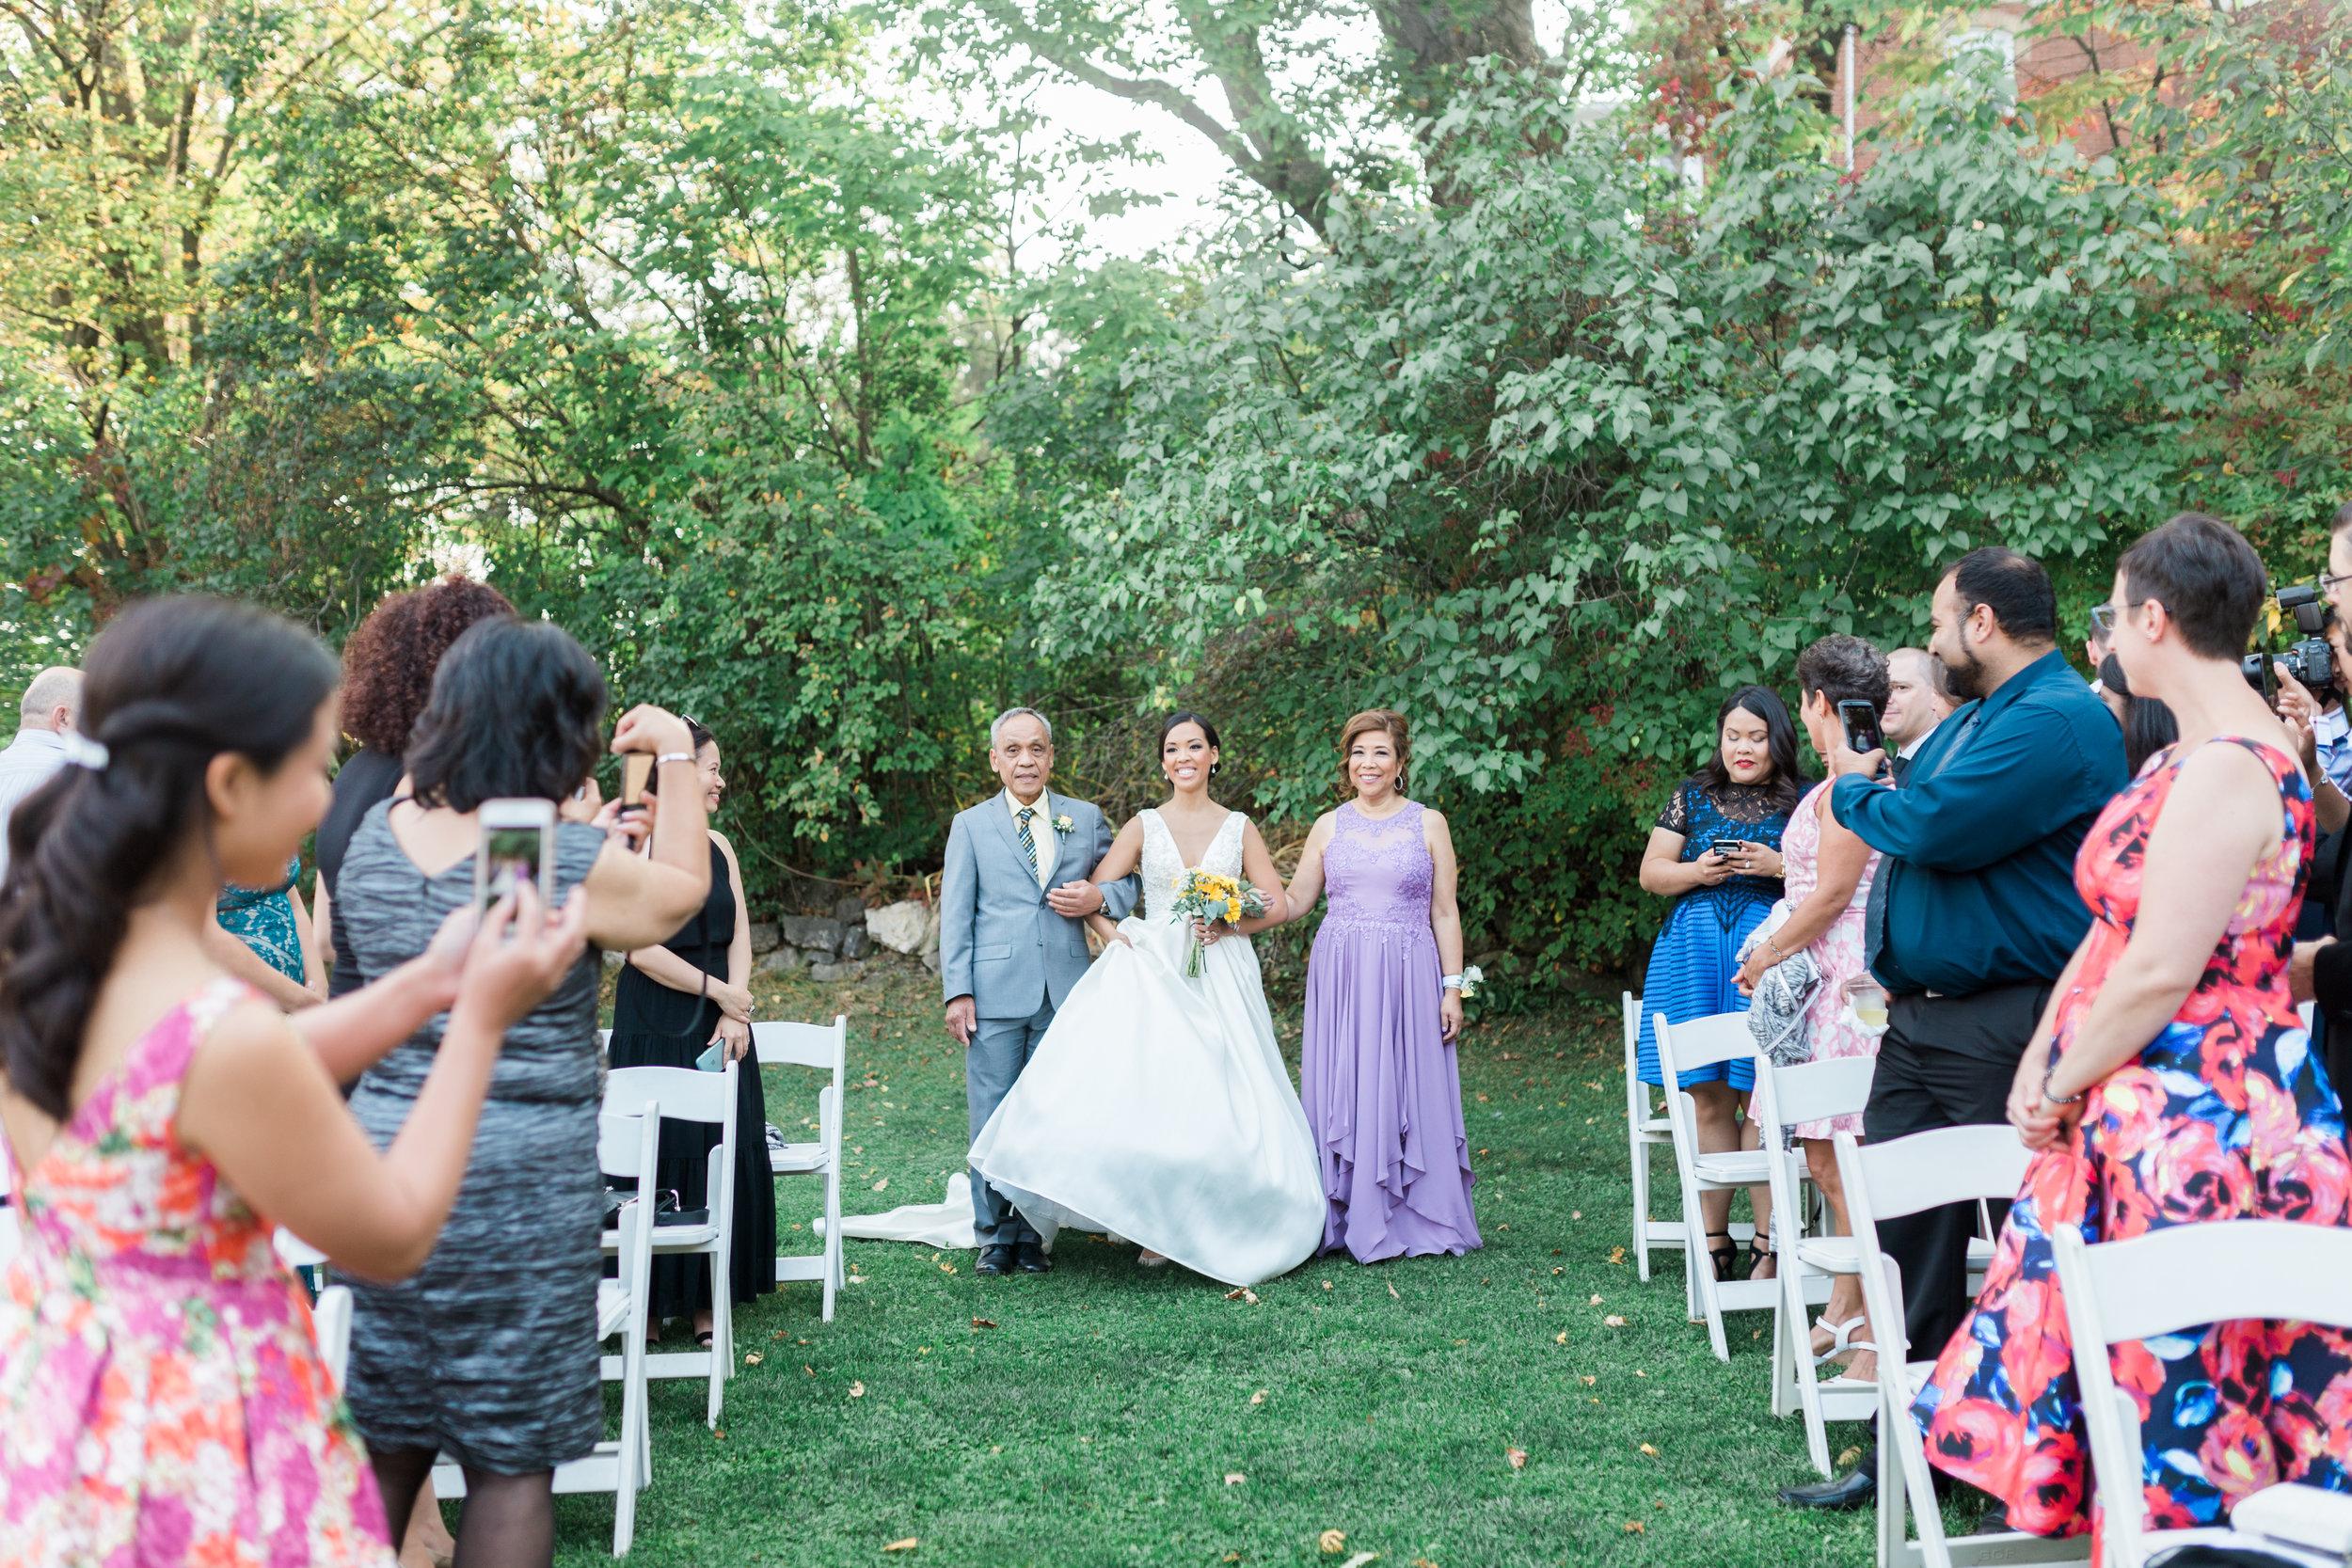 Alton Mills Wedding - Ceremony-35.jpg